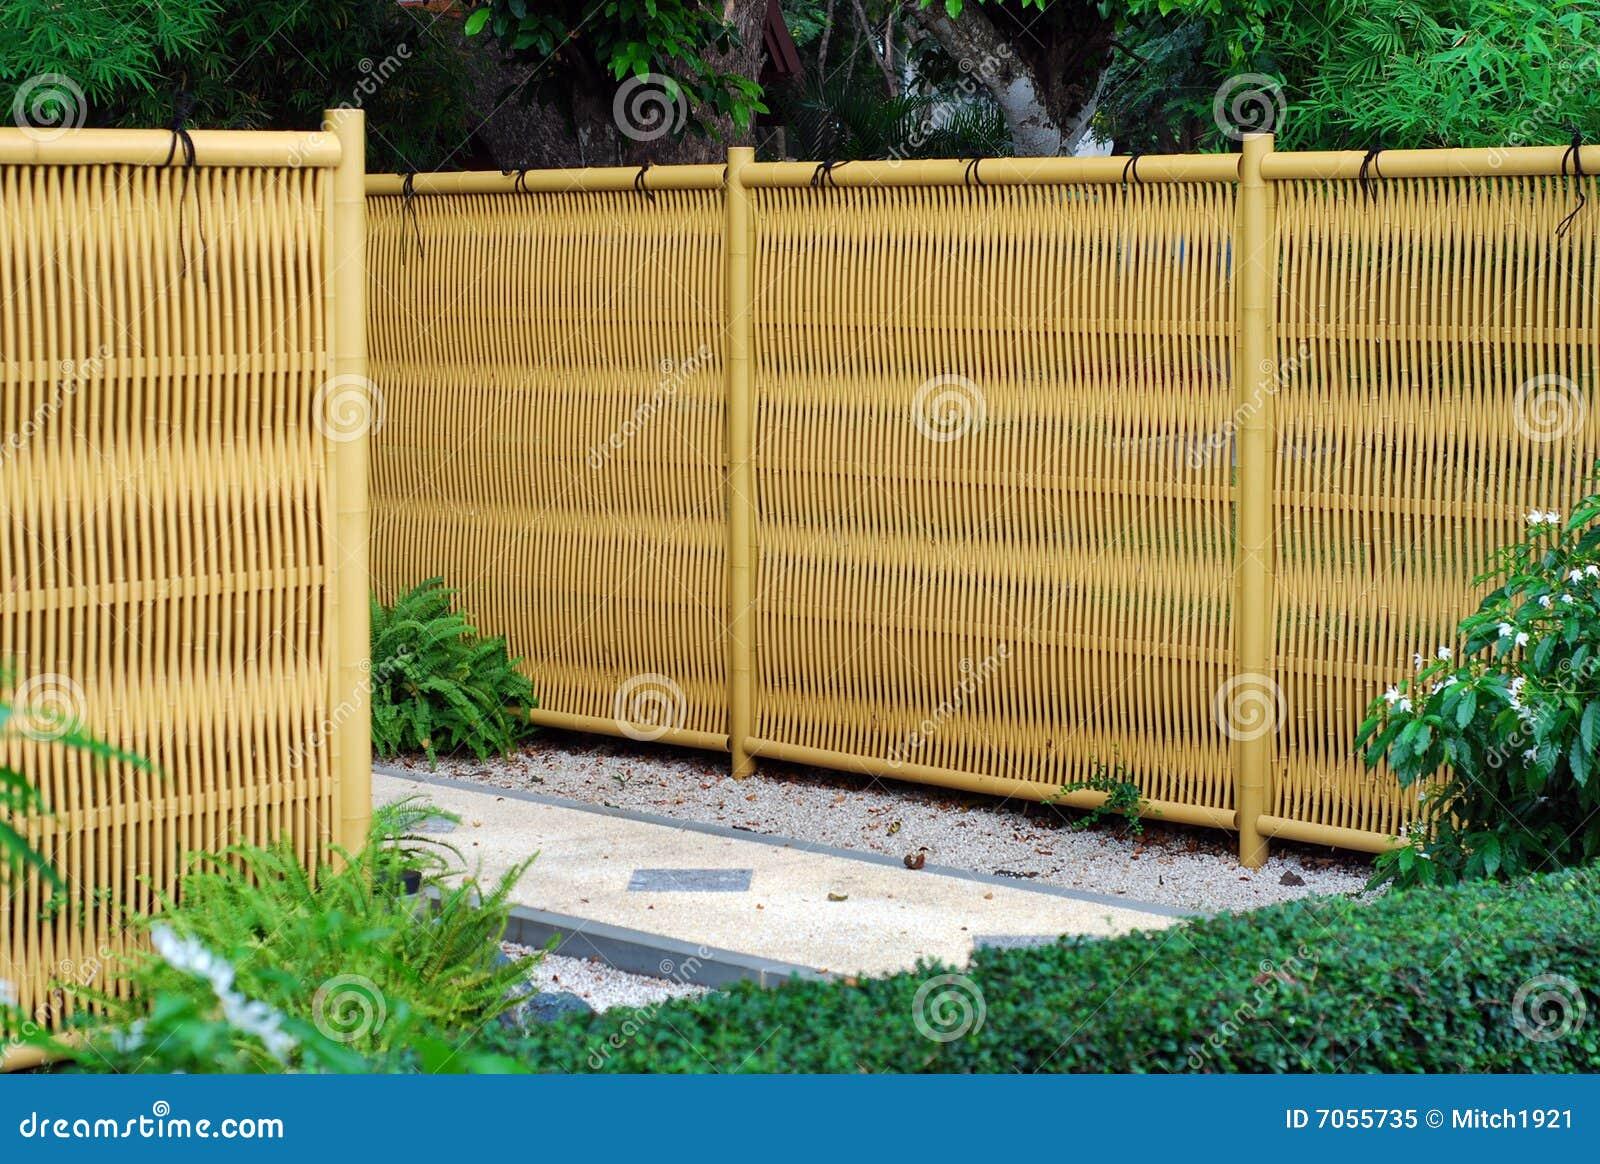 Cerca de bambu plástica do estilo japonês no jardim japonês